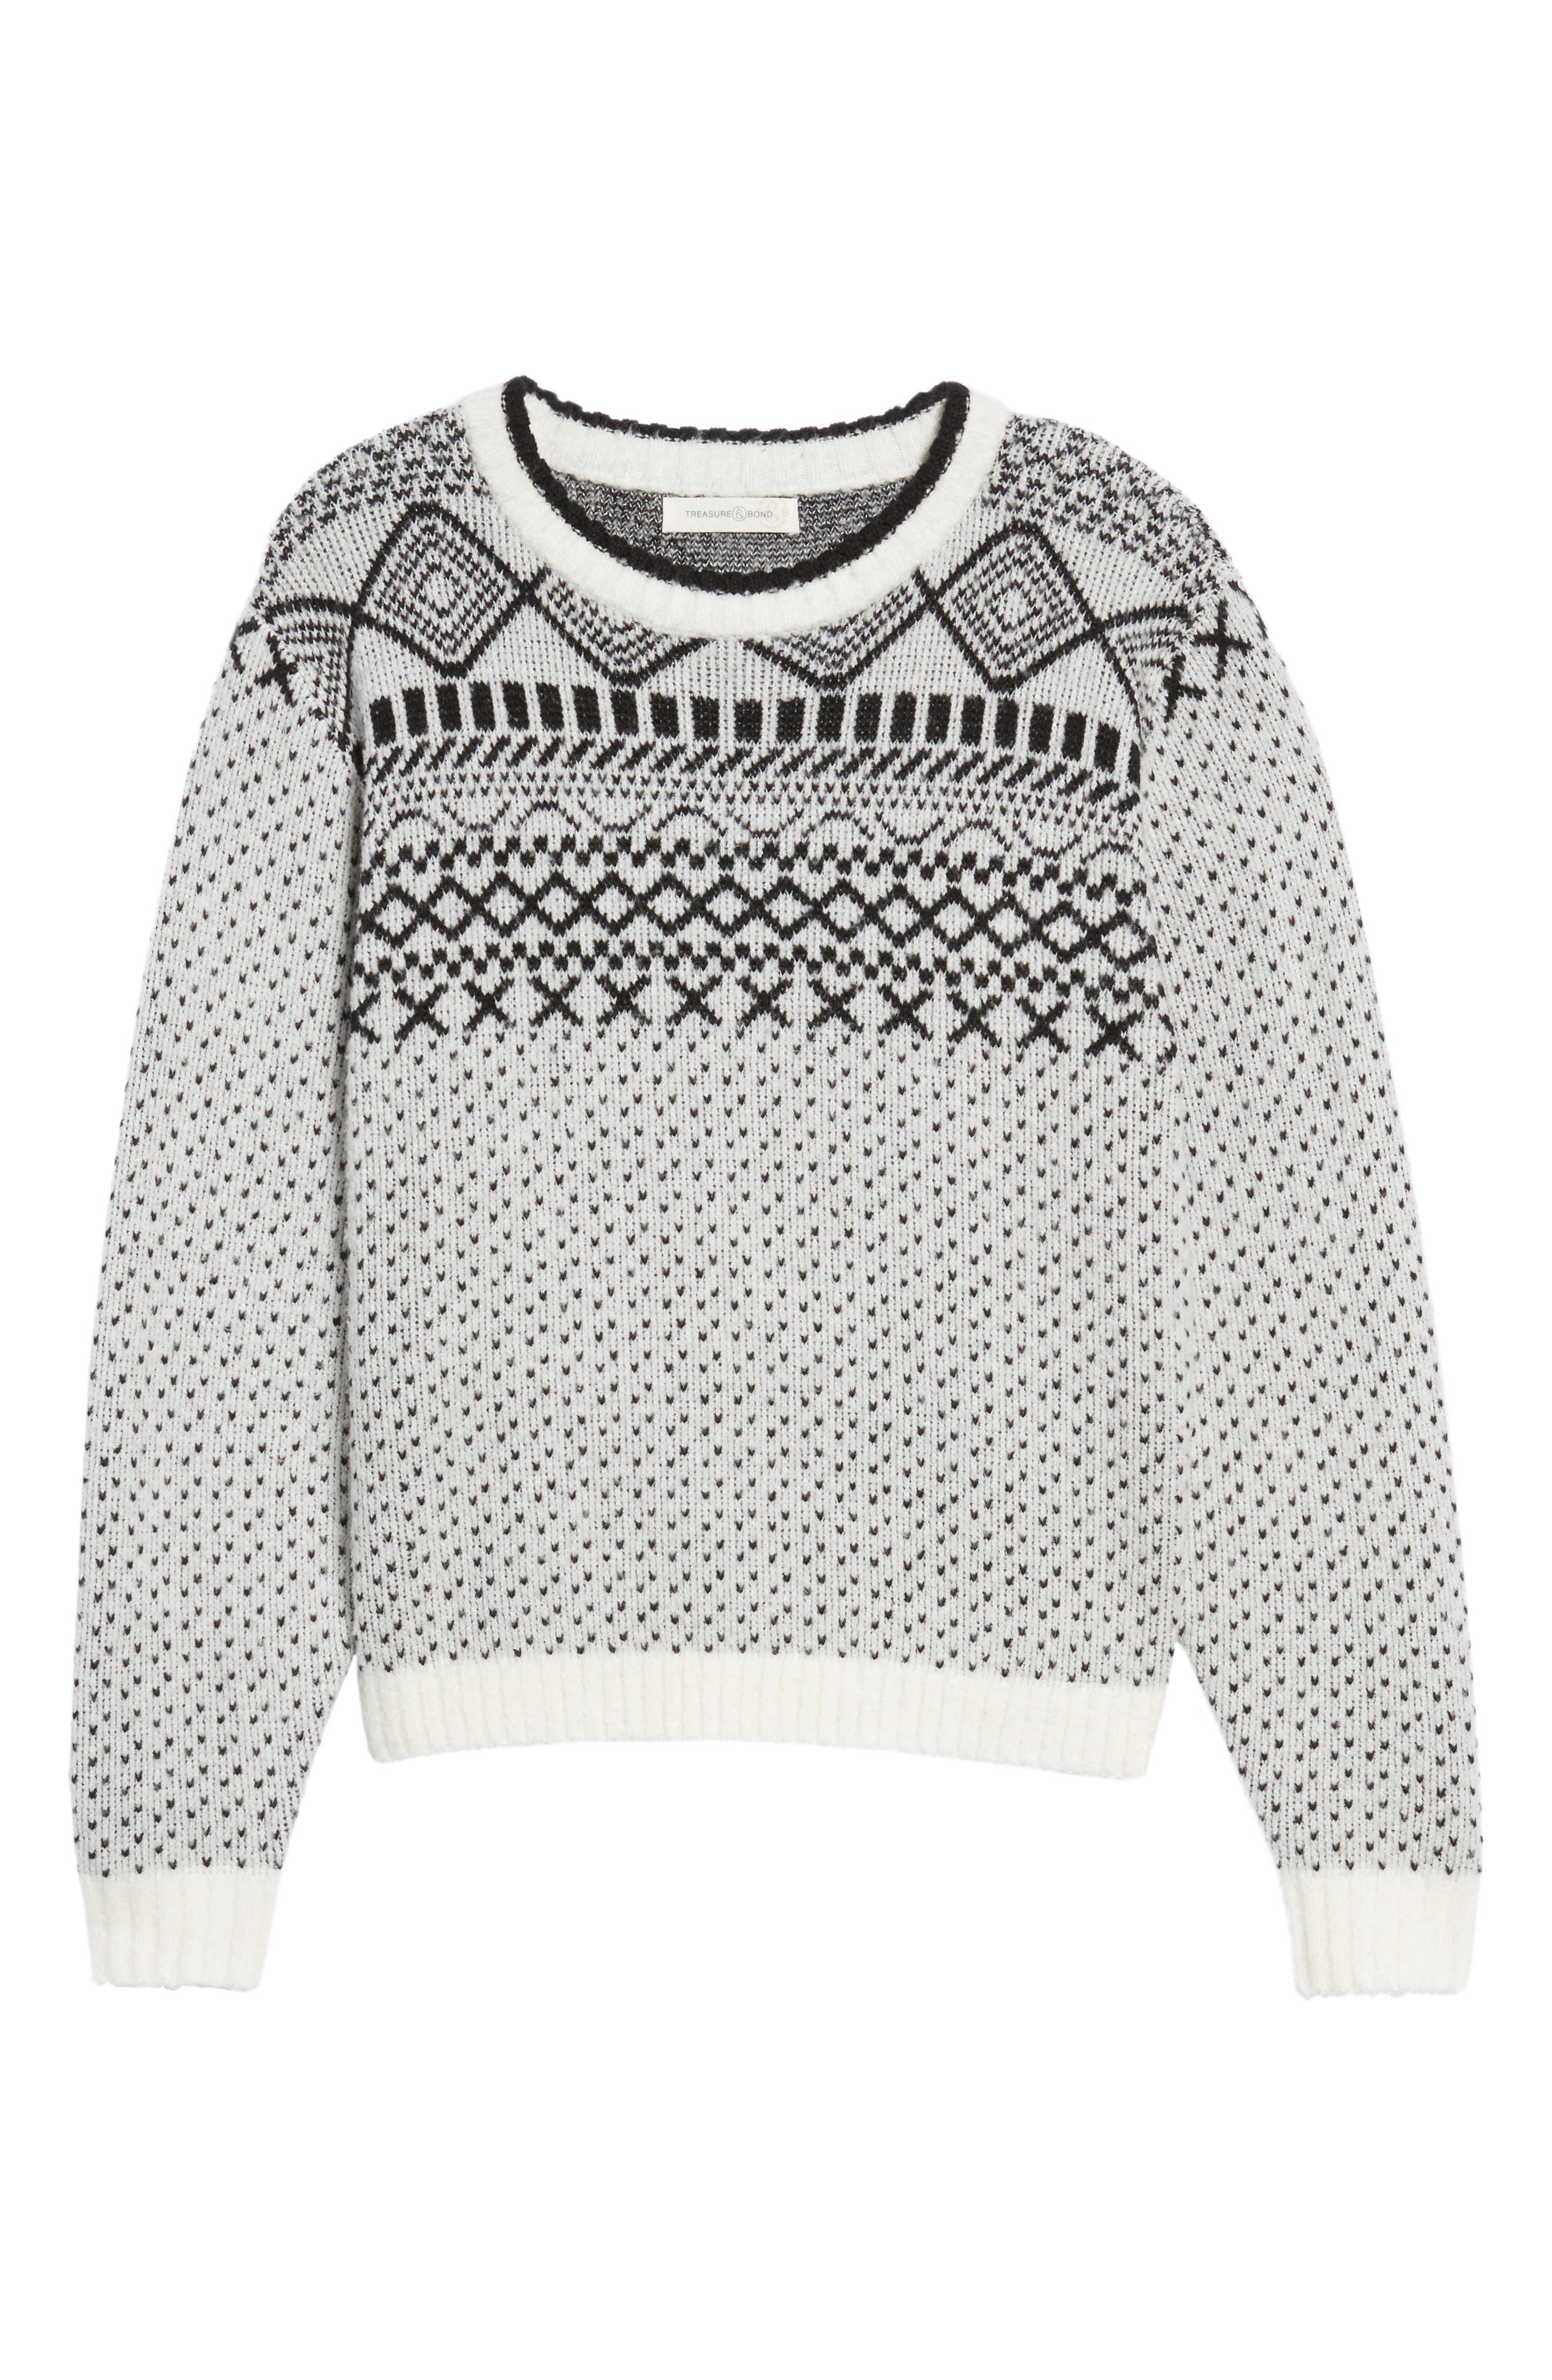 Fair Isle Sweater,                             Alternate thumbnail 7, color,                             Ivory Diamond Fairisle